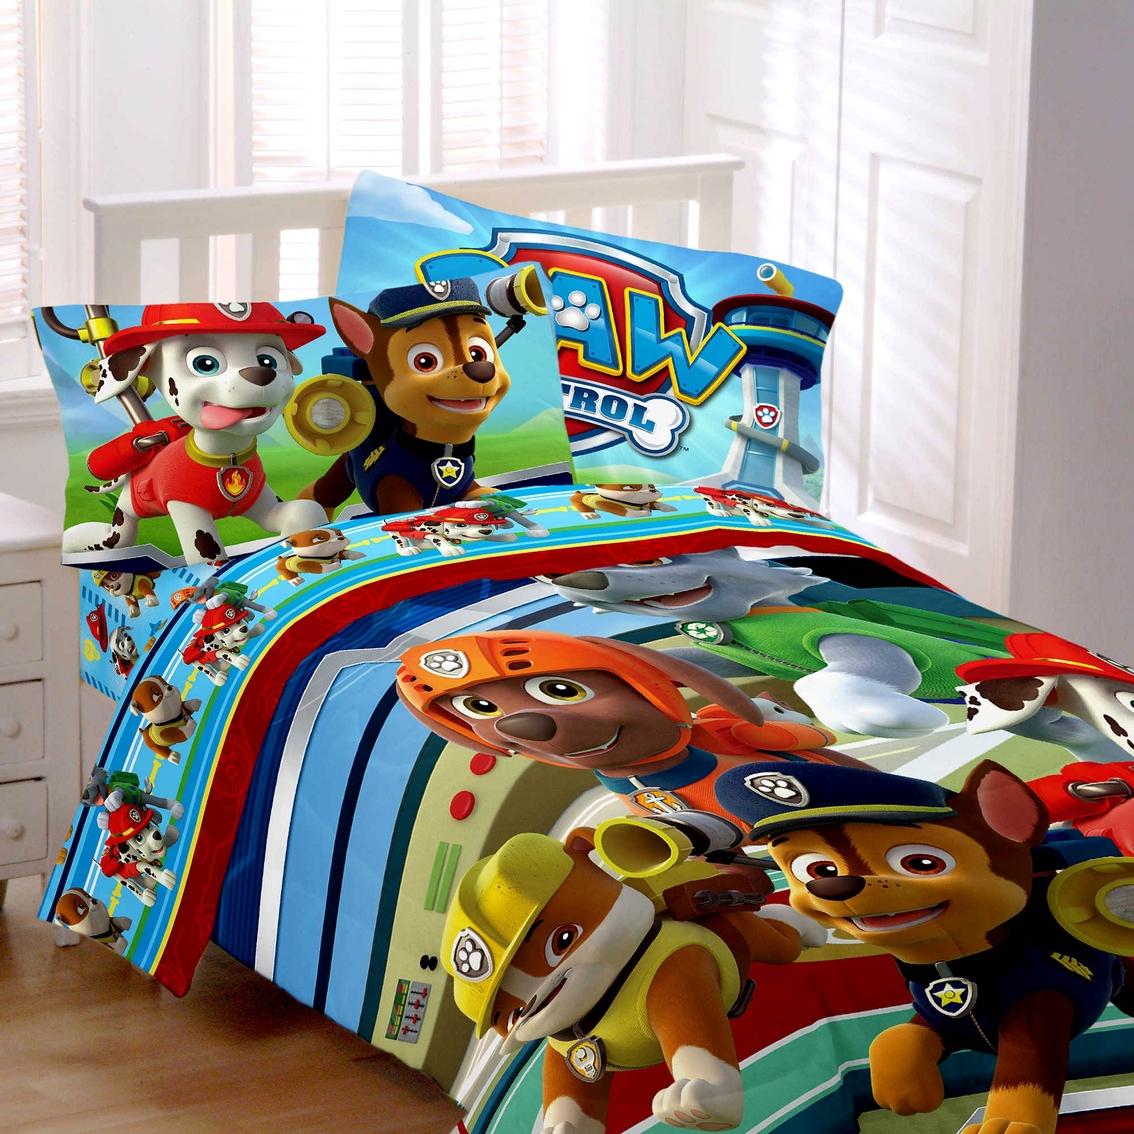 Nick Jr Paw Patrol Puppy Hero Comforter Bedspreads